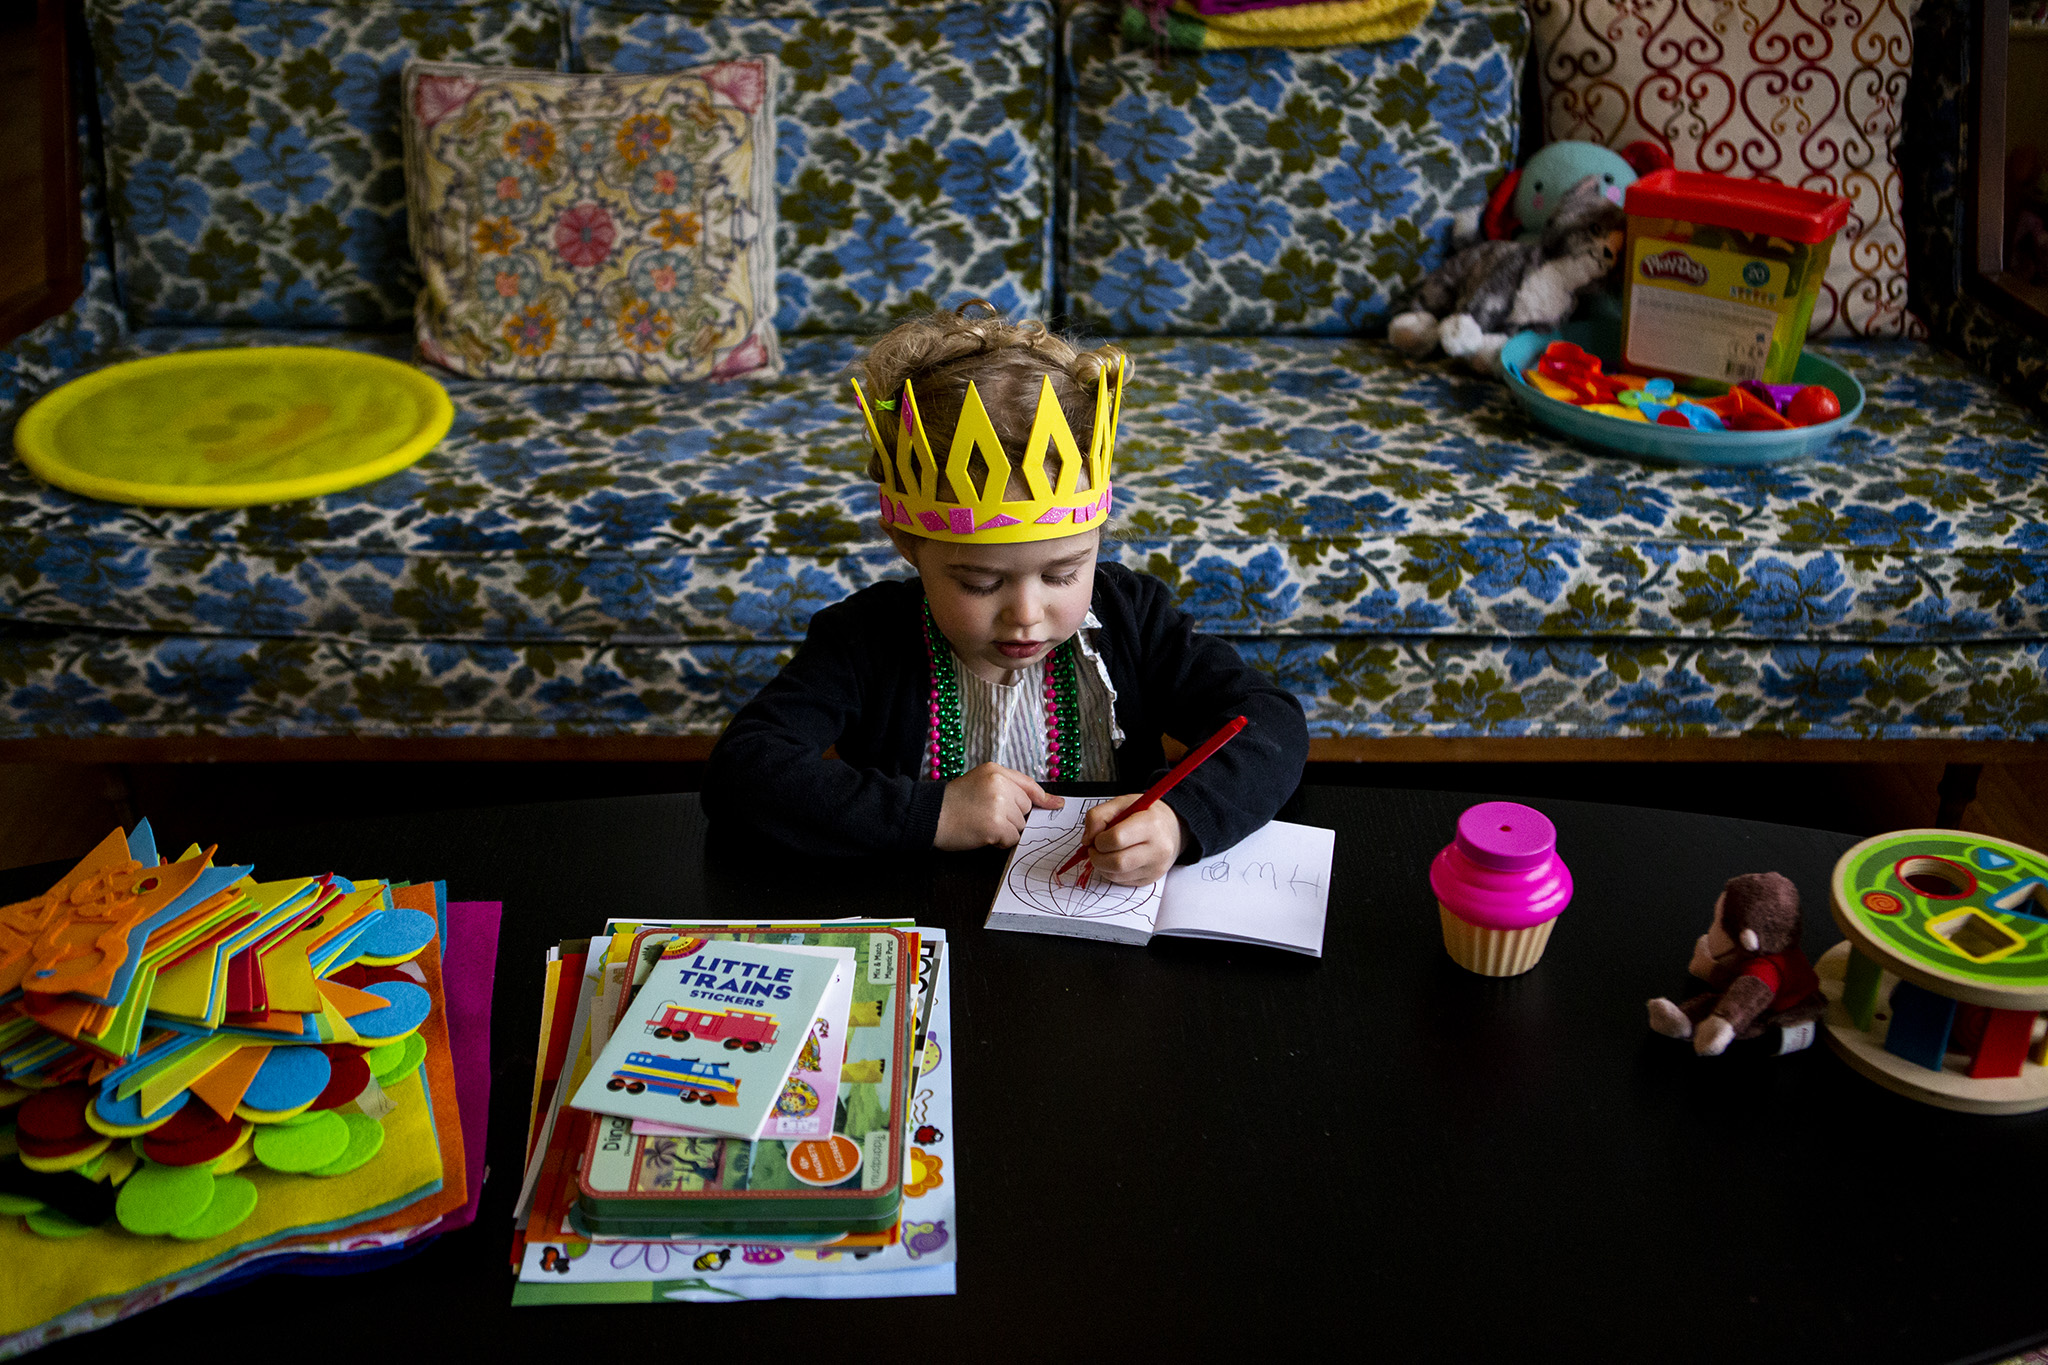 colorful-environmental-child-portrait.jpg